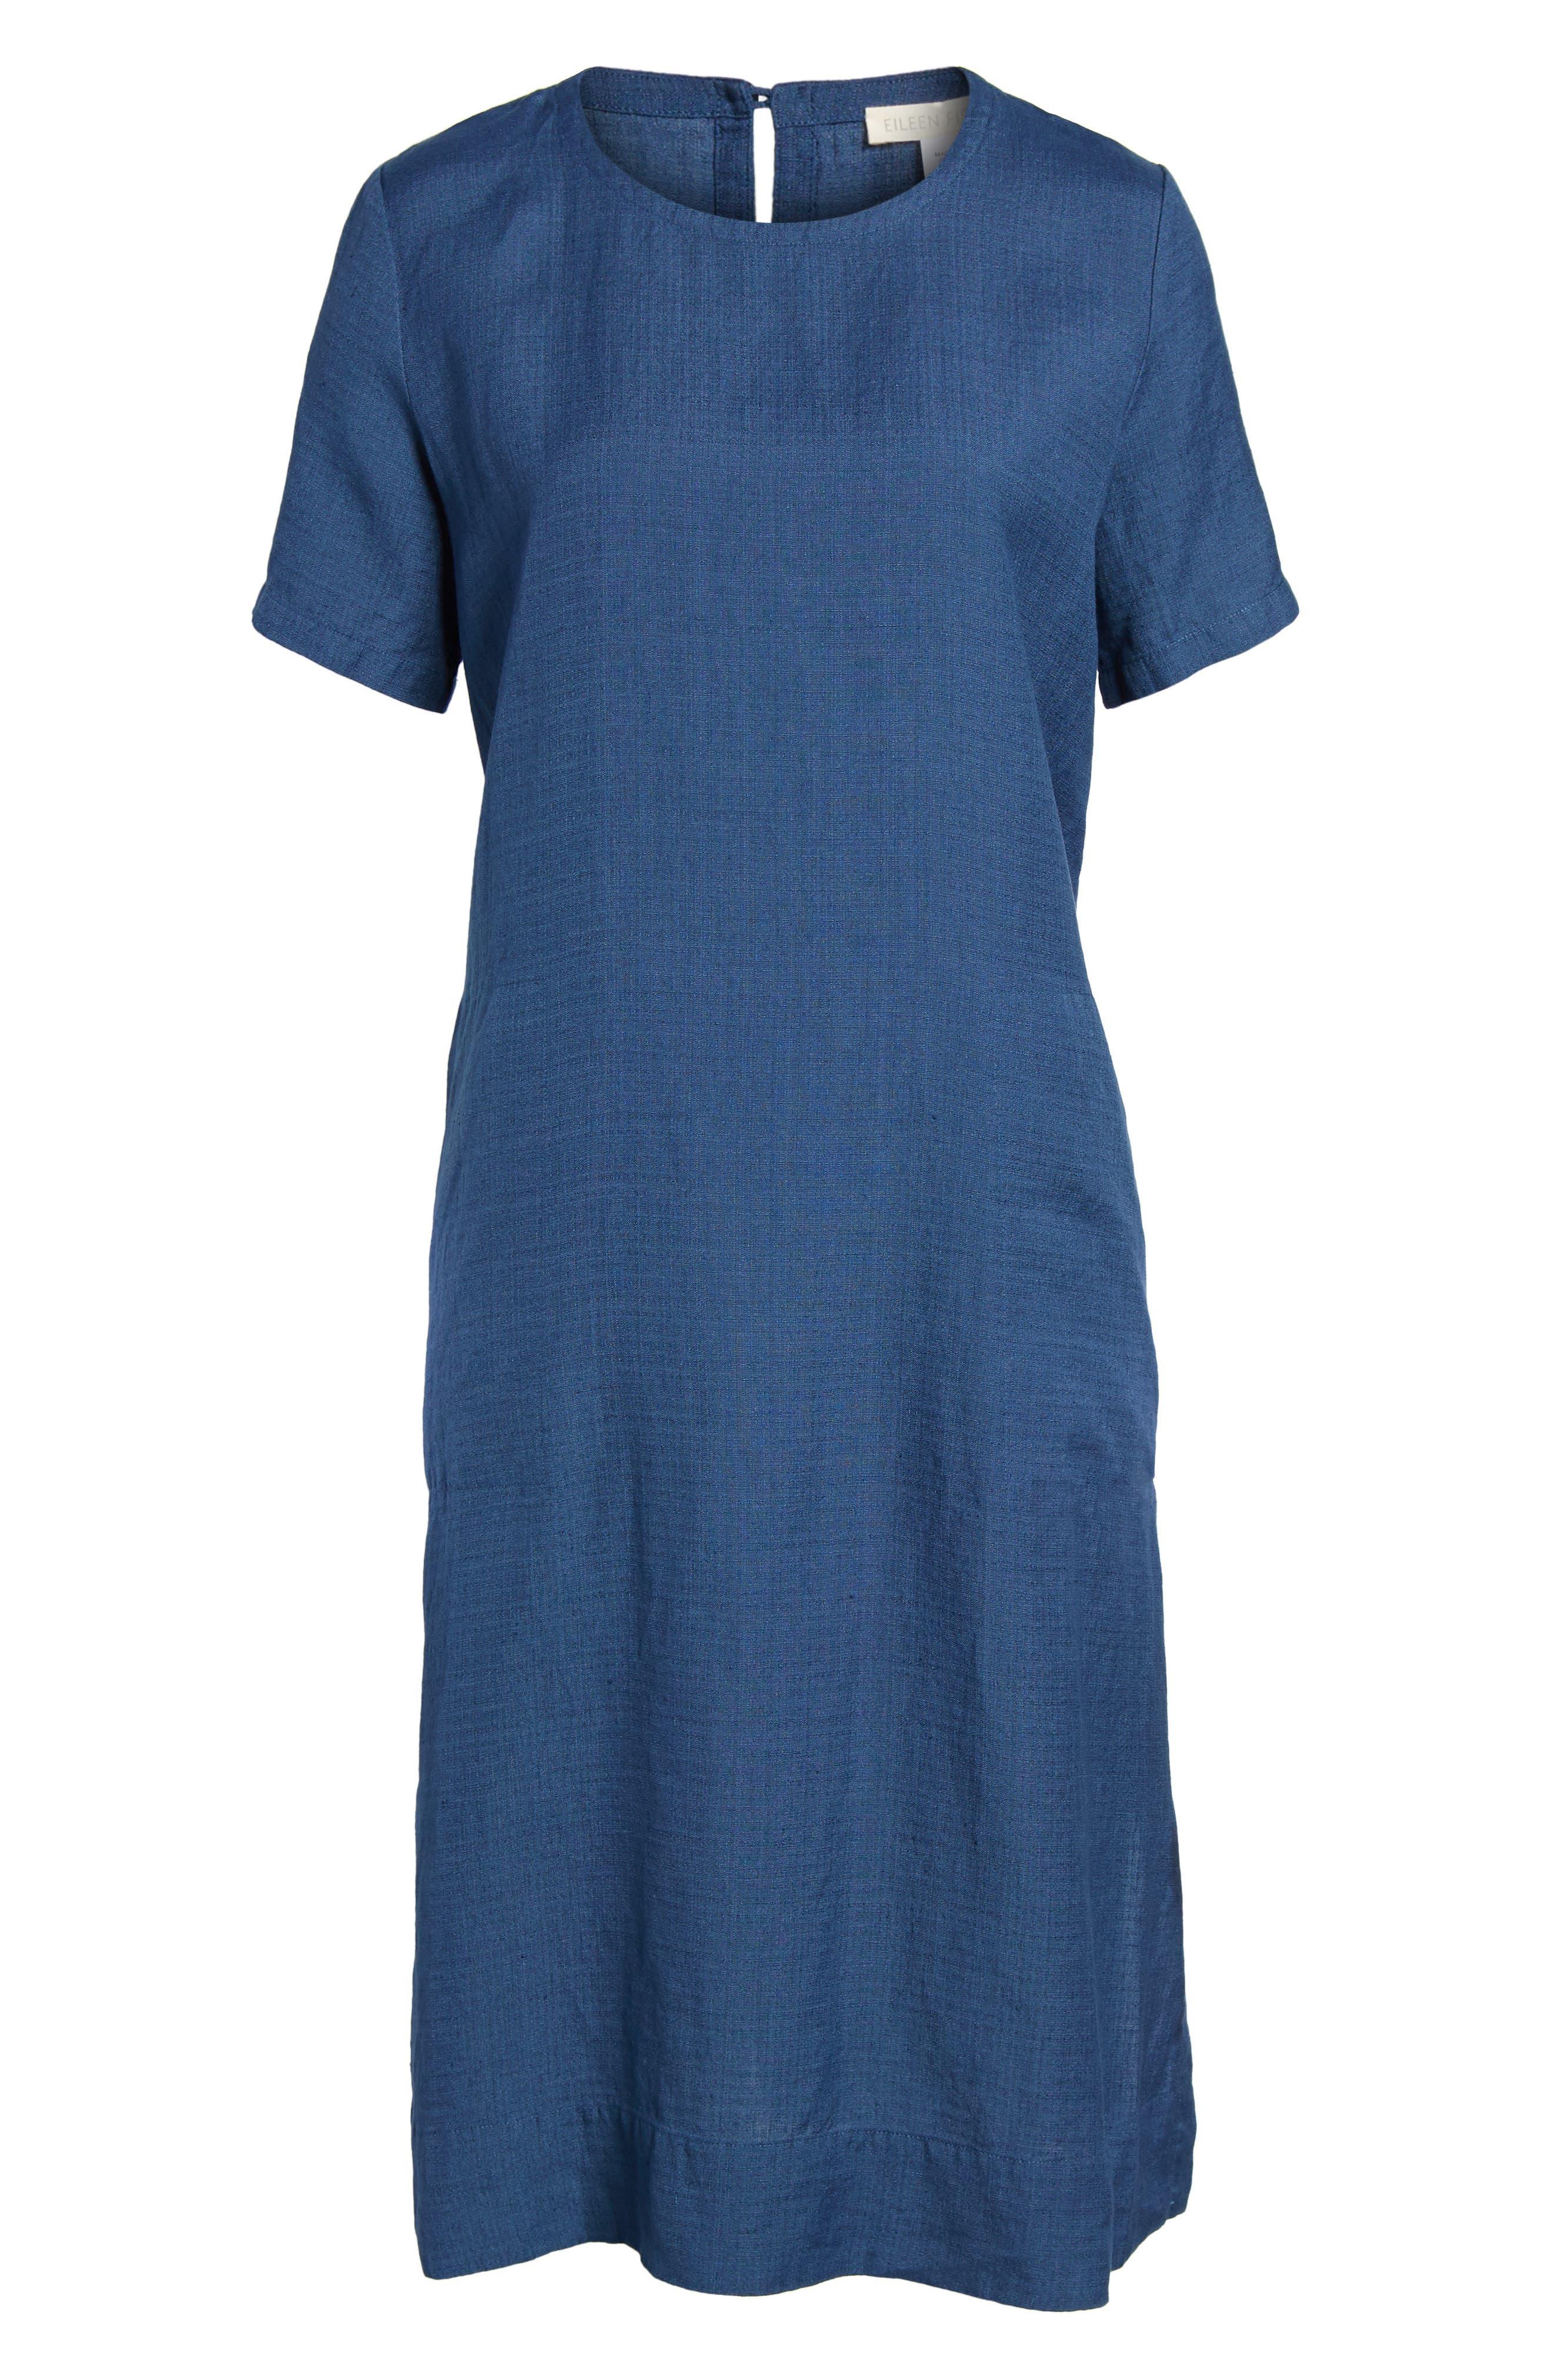 Linen Blend Shift Dress,                             Alternate thumbnail 6, color,                             480